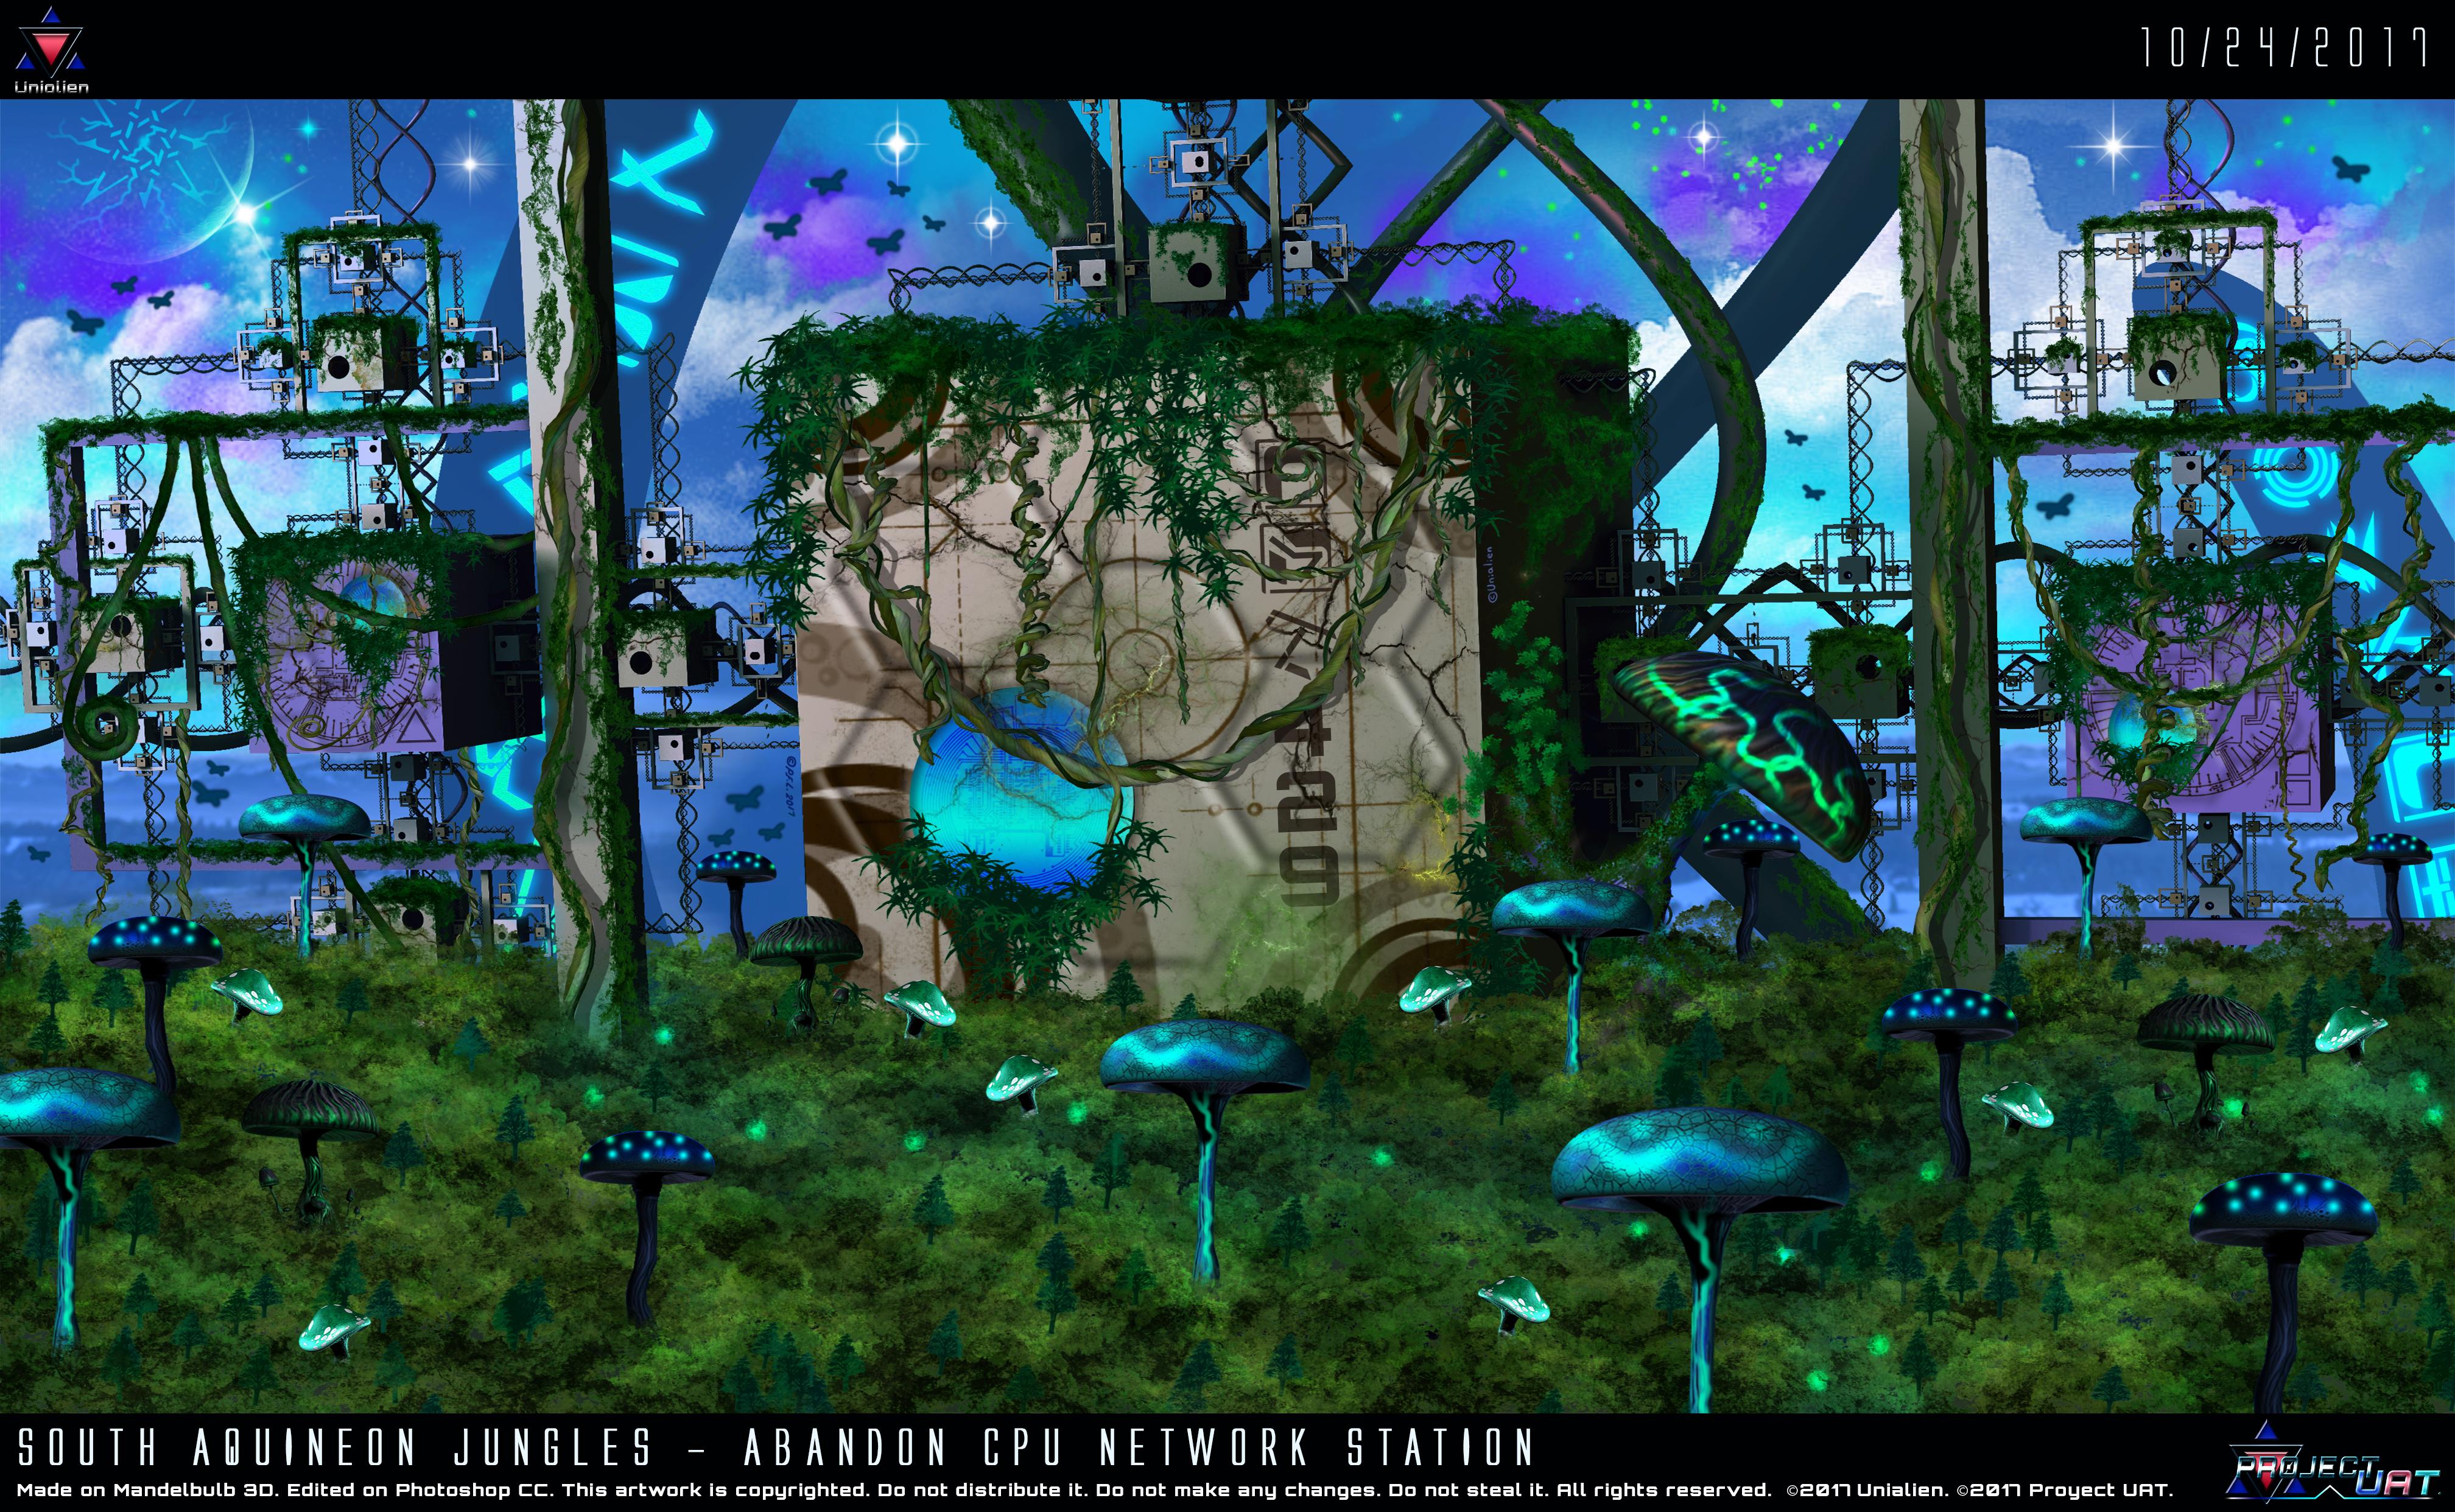 South Aquineon Jungles-Abandon CPU Network Station